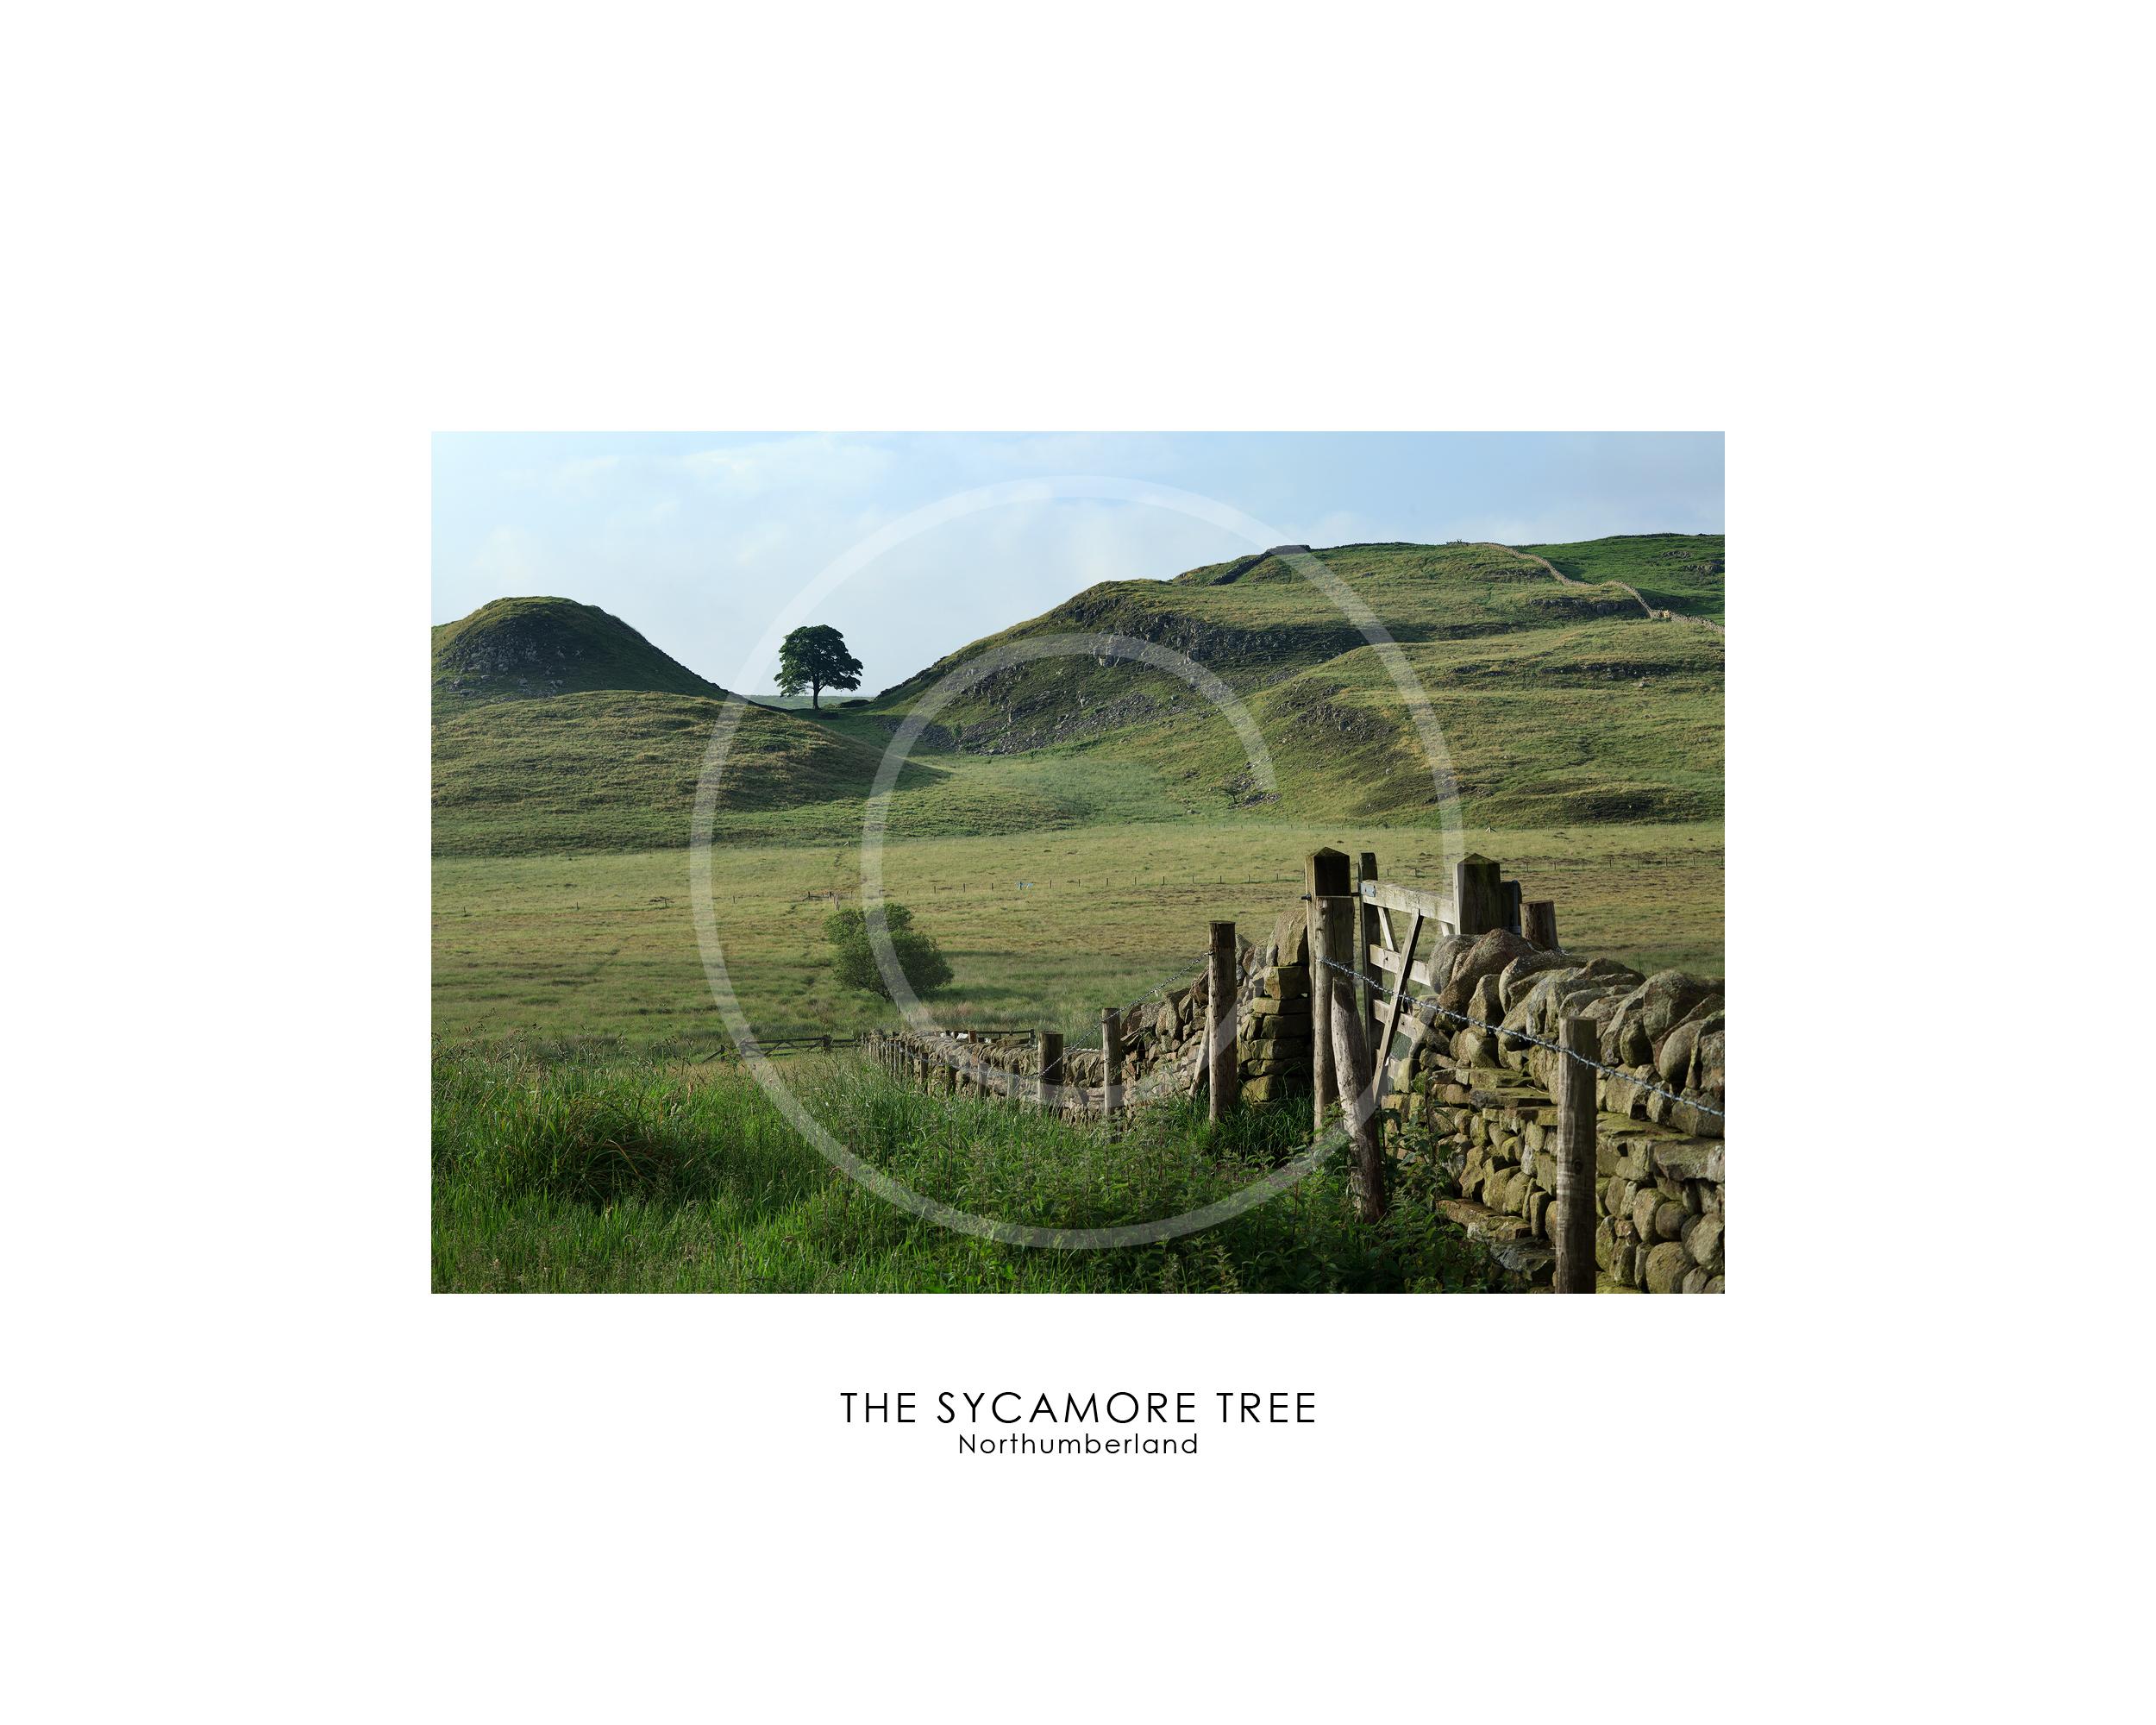 sycamore tree Northumberland